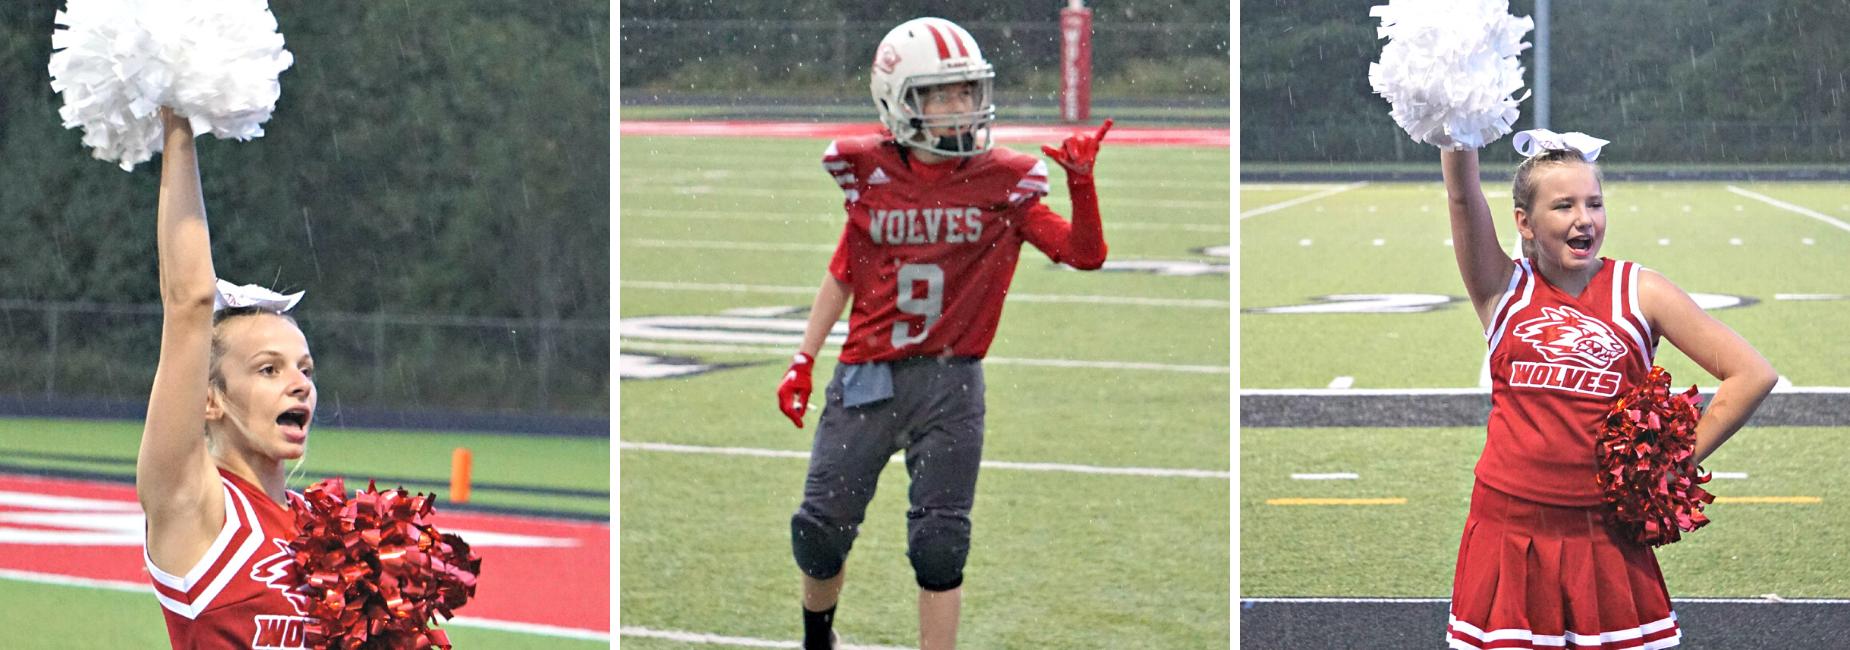 football and cheerleading